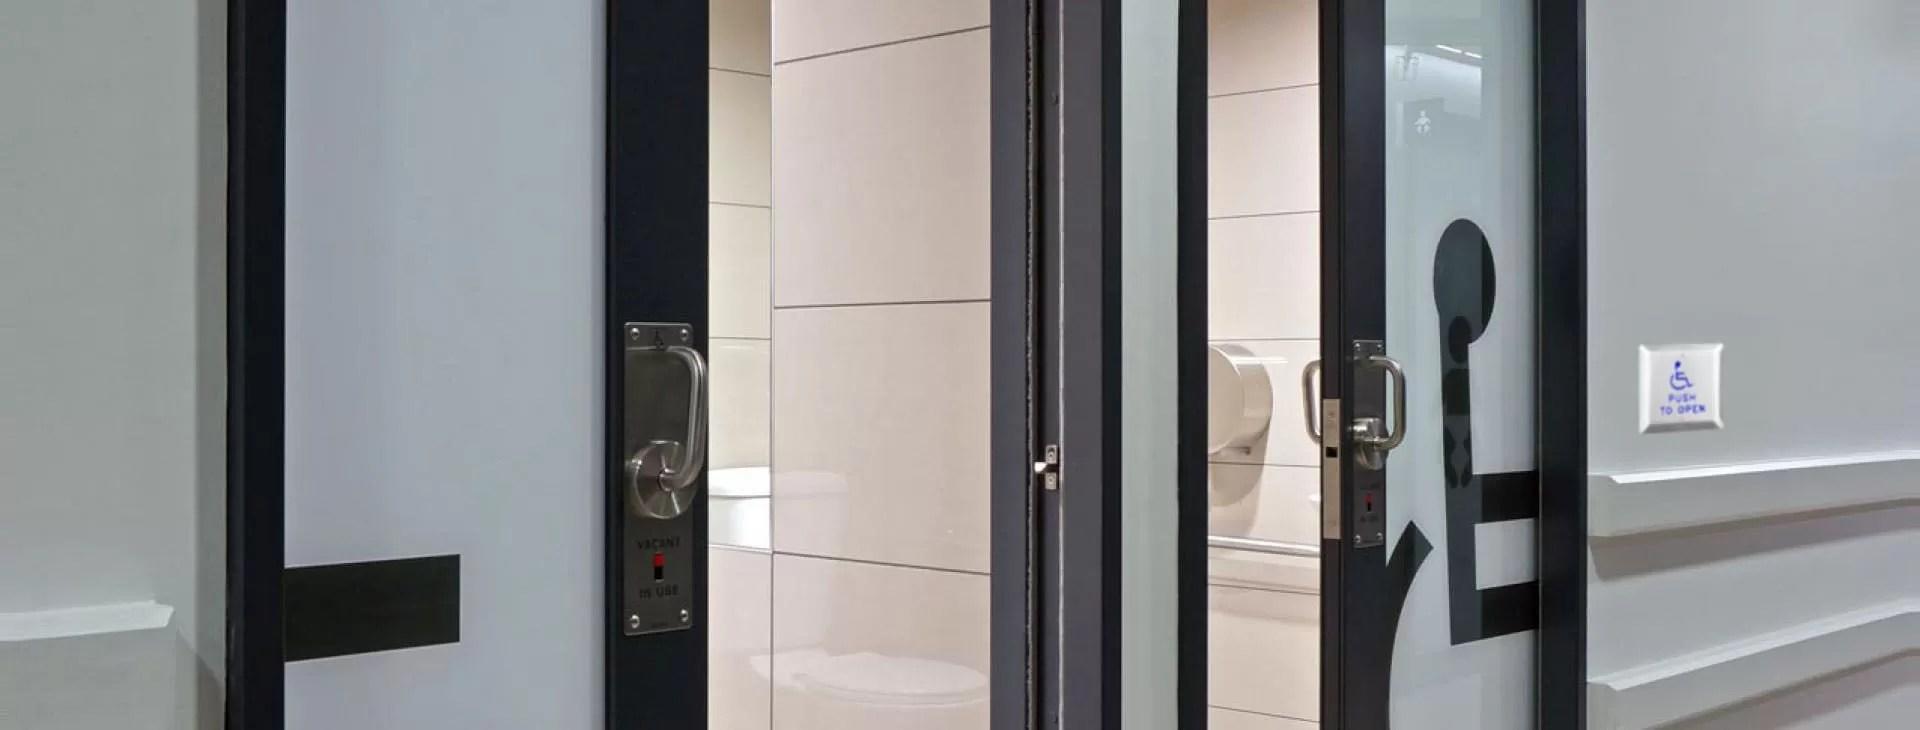 Automatic toilet Doors opener installation